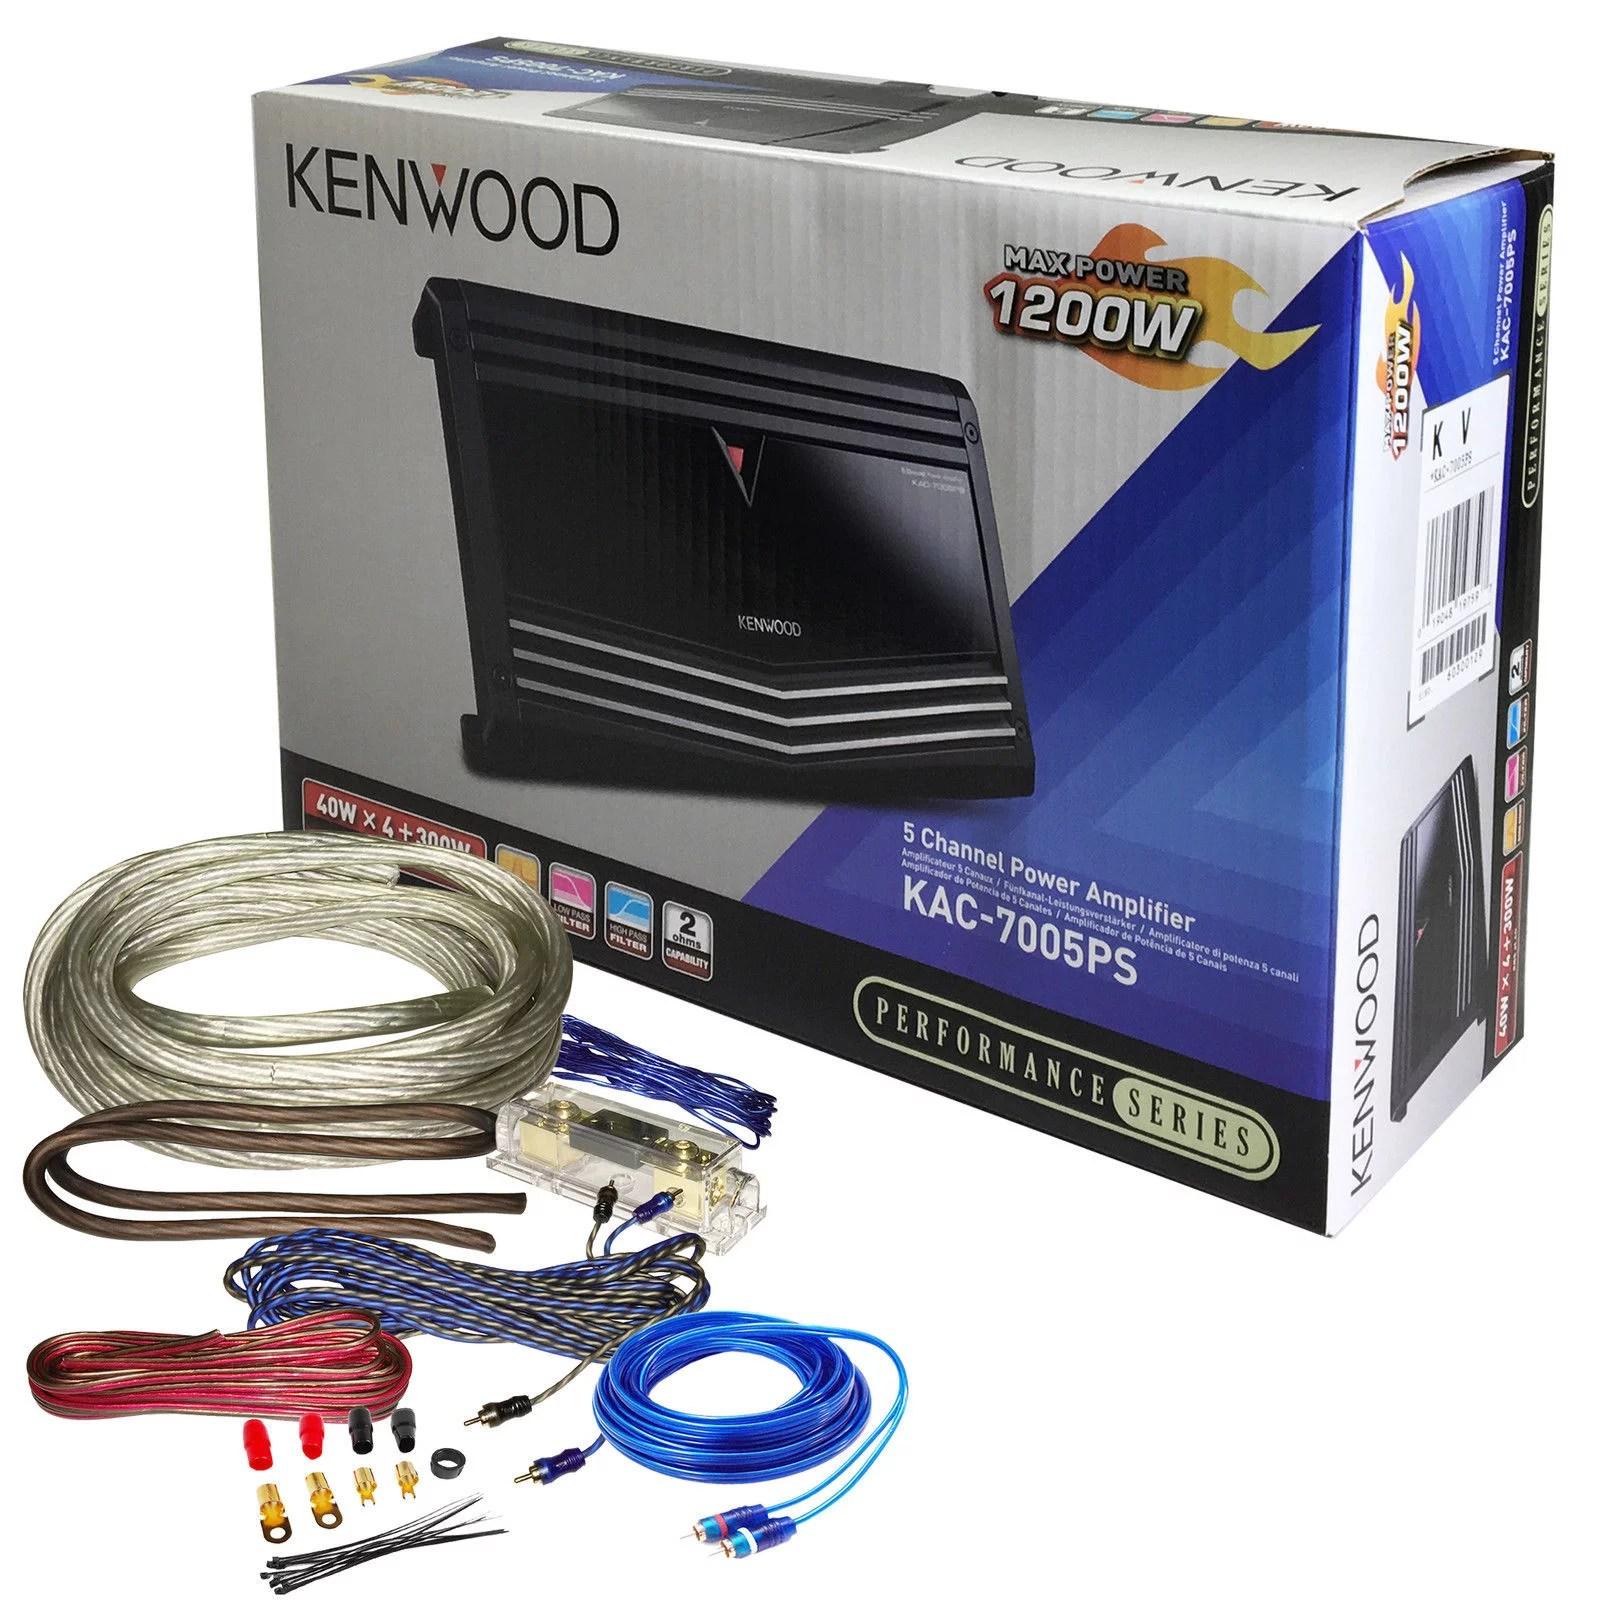 kenwood kac 7005ps 700w rms 5 channel car amplifier 1200w w wiringkenwood kac 7005ps 700w rms [ 1600 x 1600 Pixel ]